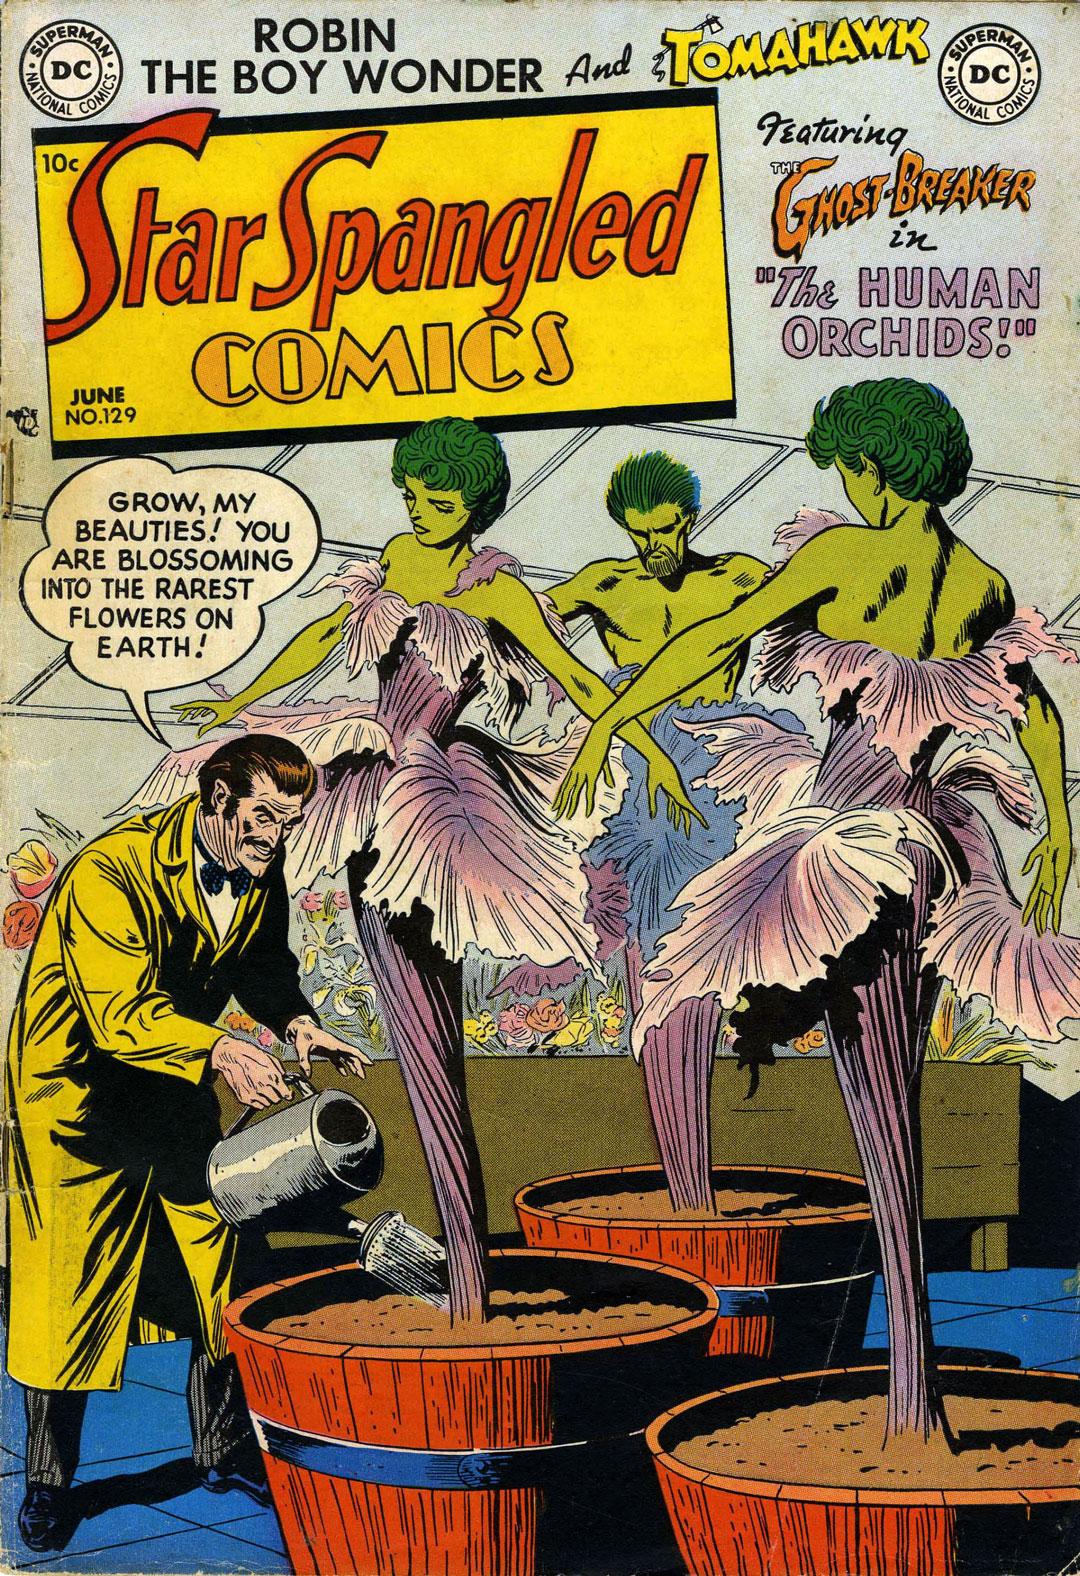 Star Spangled Comics (1941) 129 Page 1